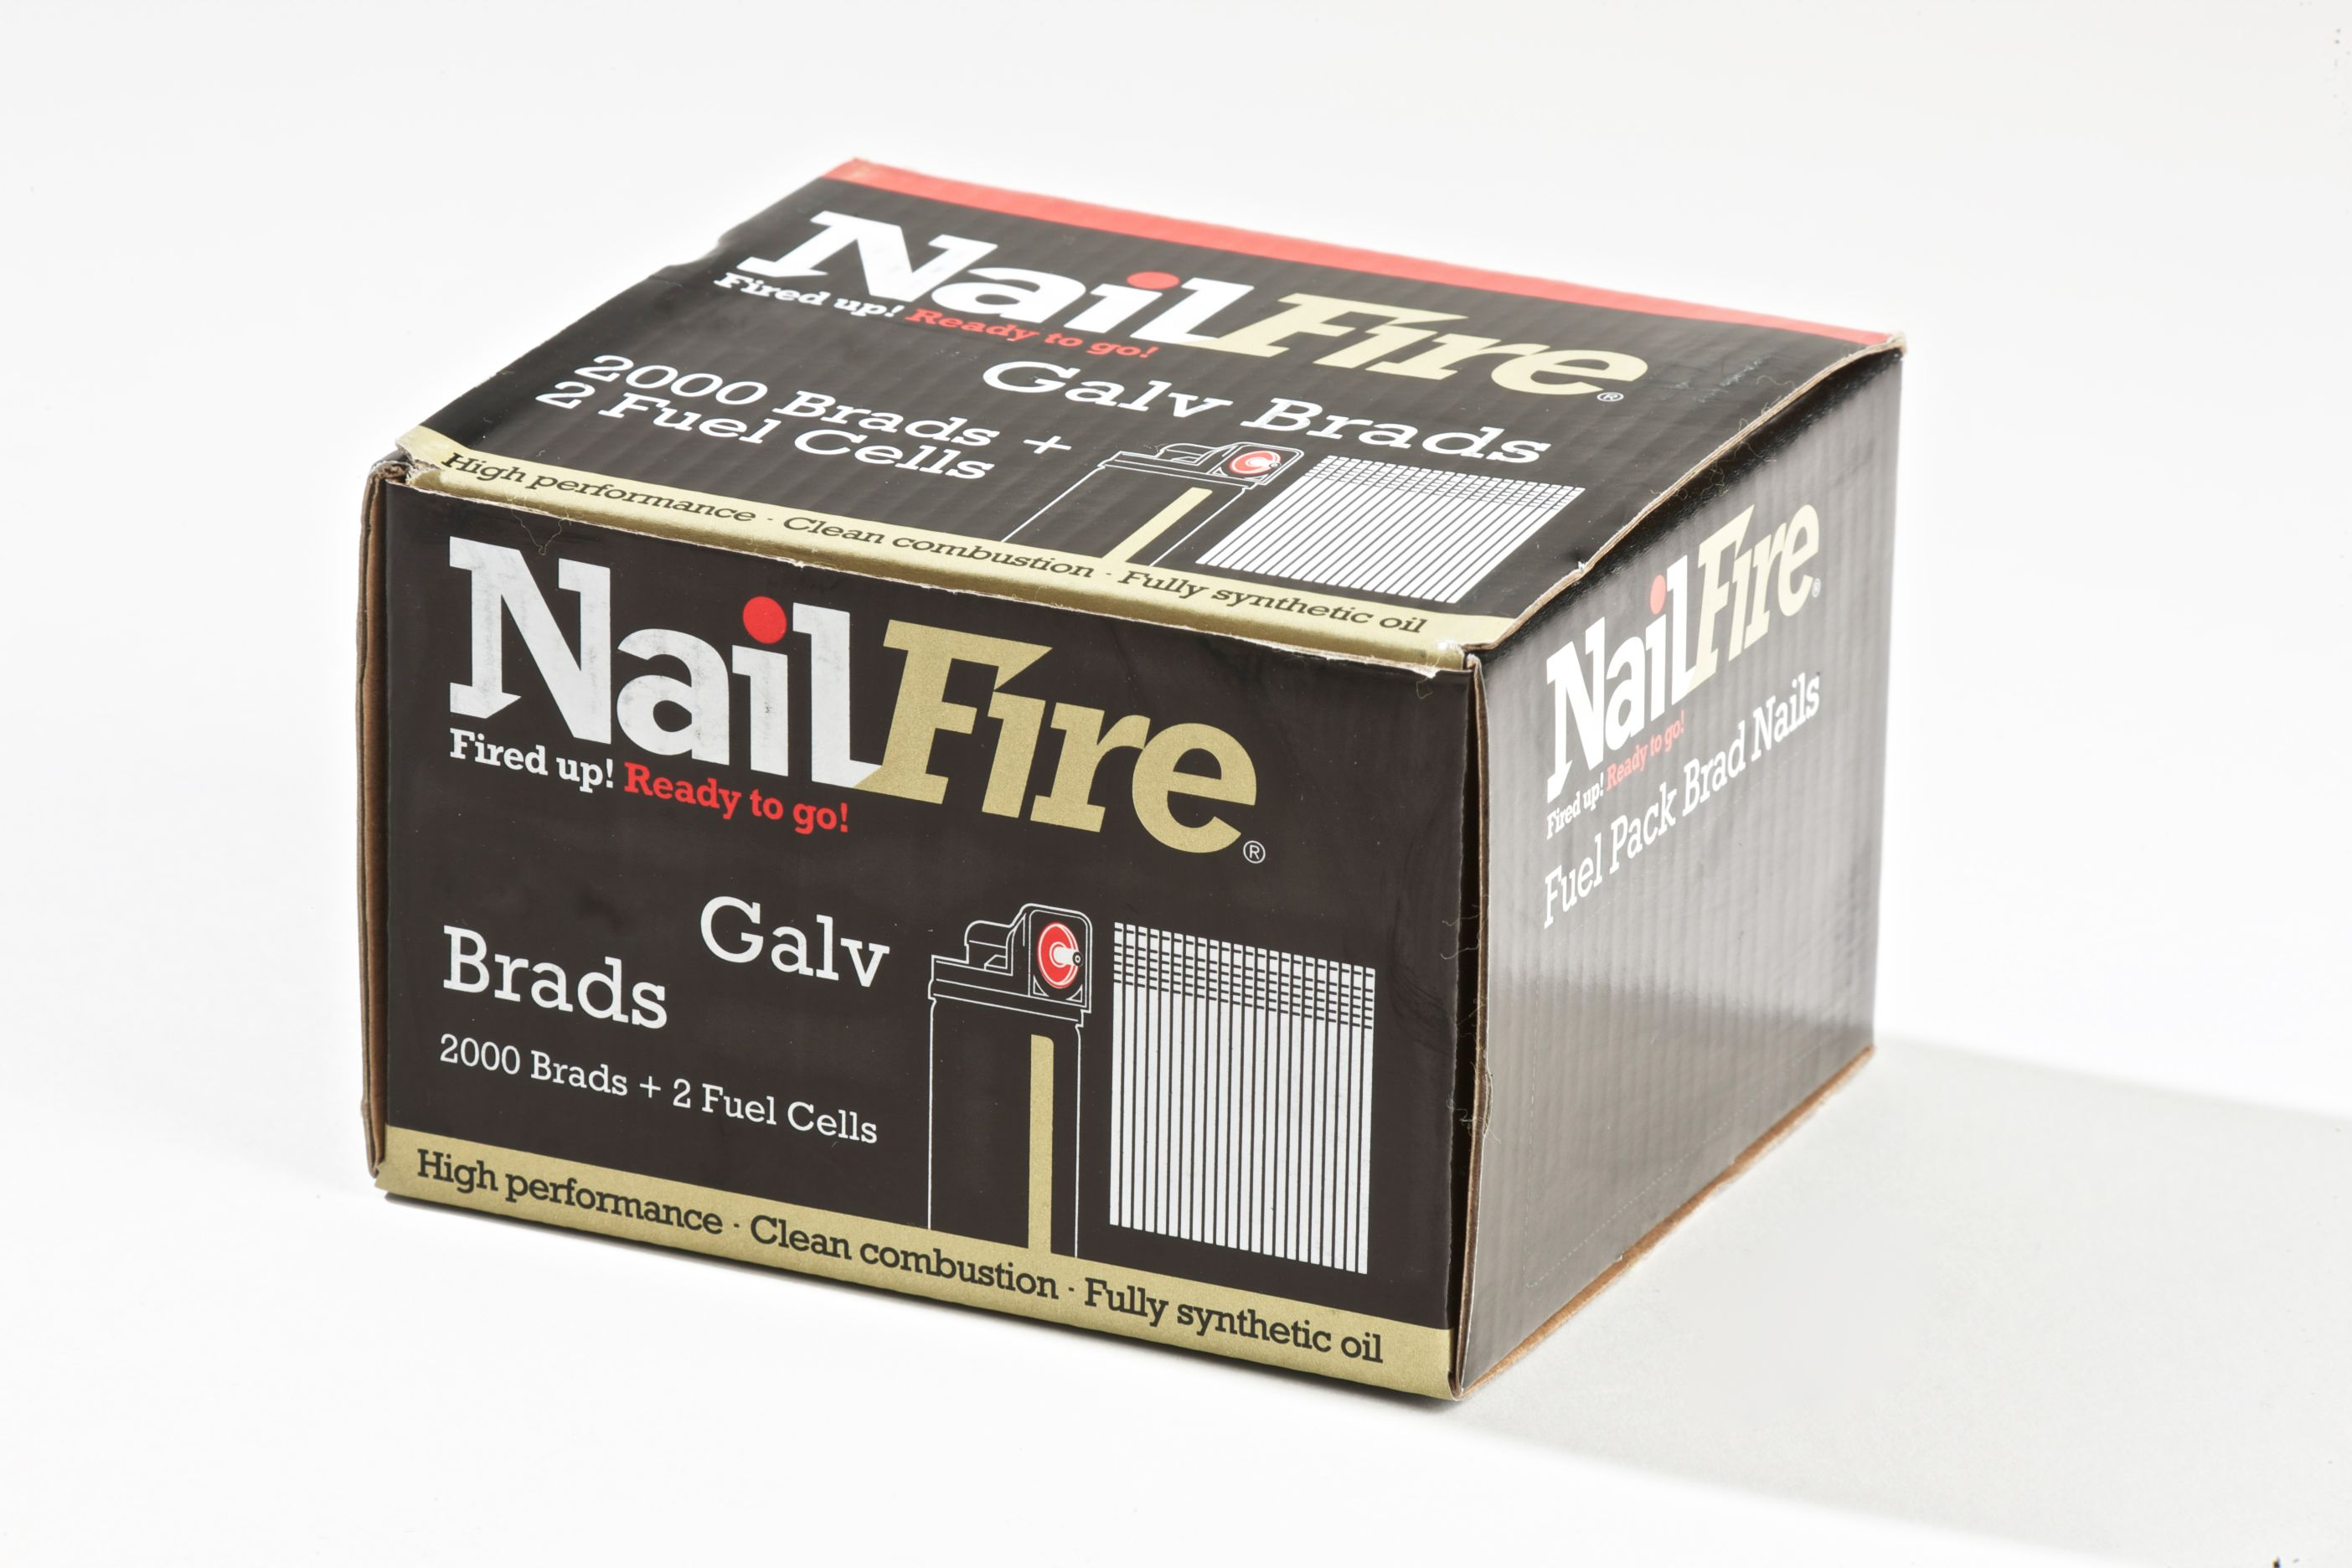 NAILFIRE 2ND FIX STRAIGHT E-GALV BRAD & FUEL PACK 45MM (TUB OF 2000)